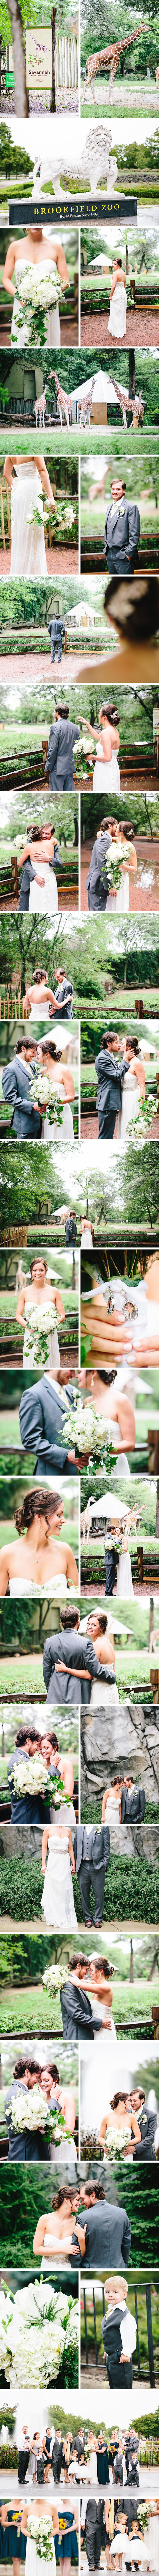 Chicago_Fine_Art_Wedding_Photography_hernandez1.jpg